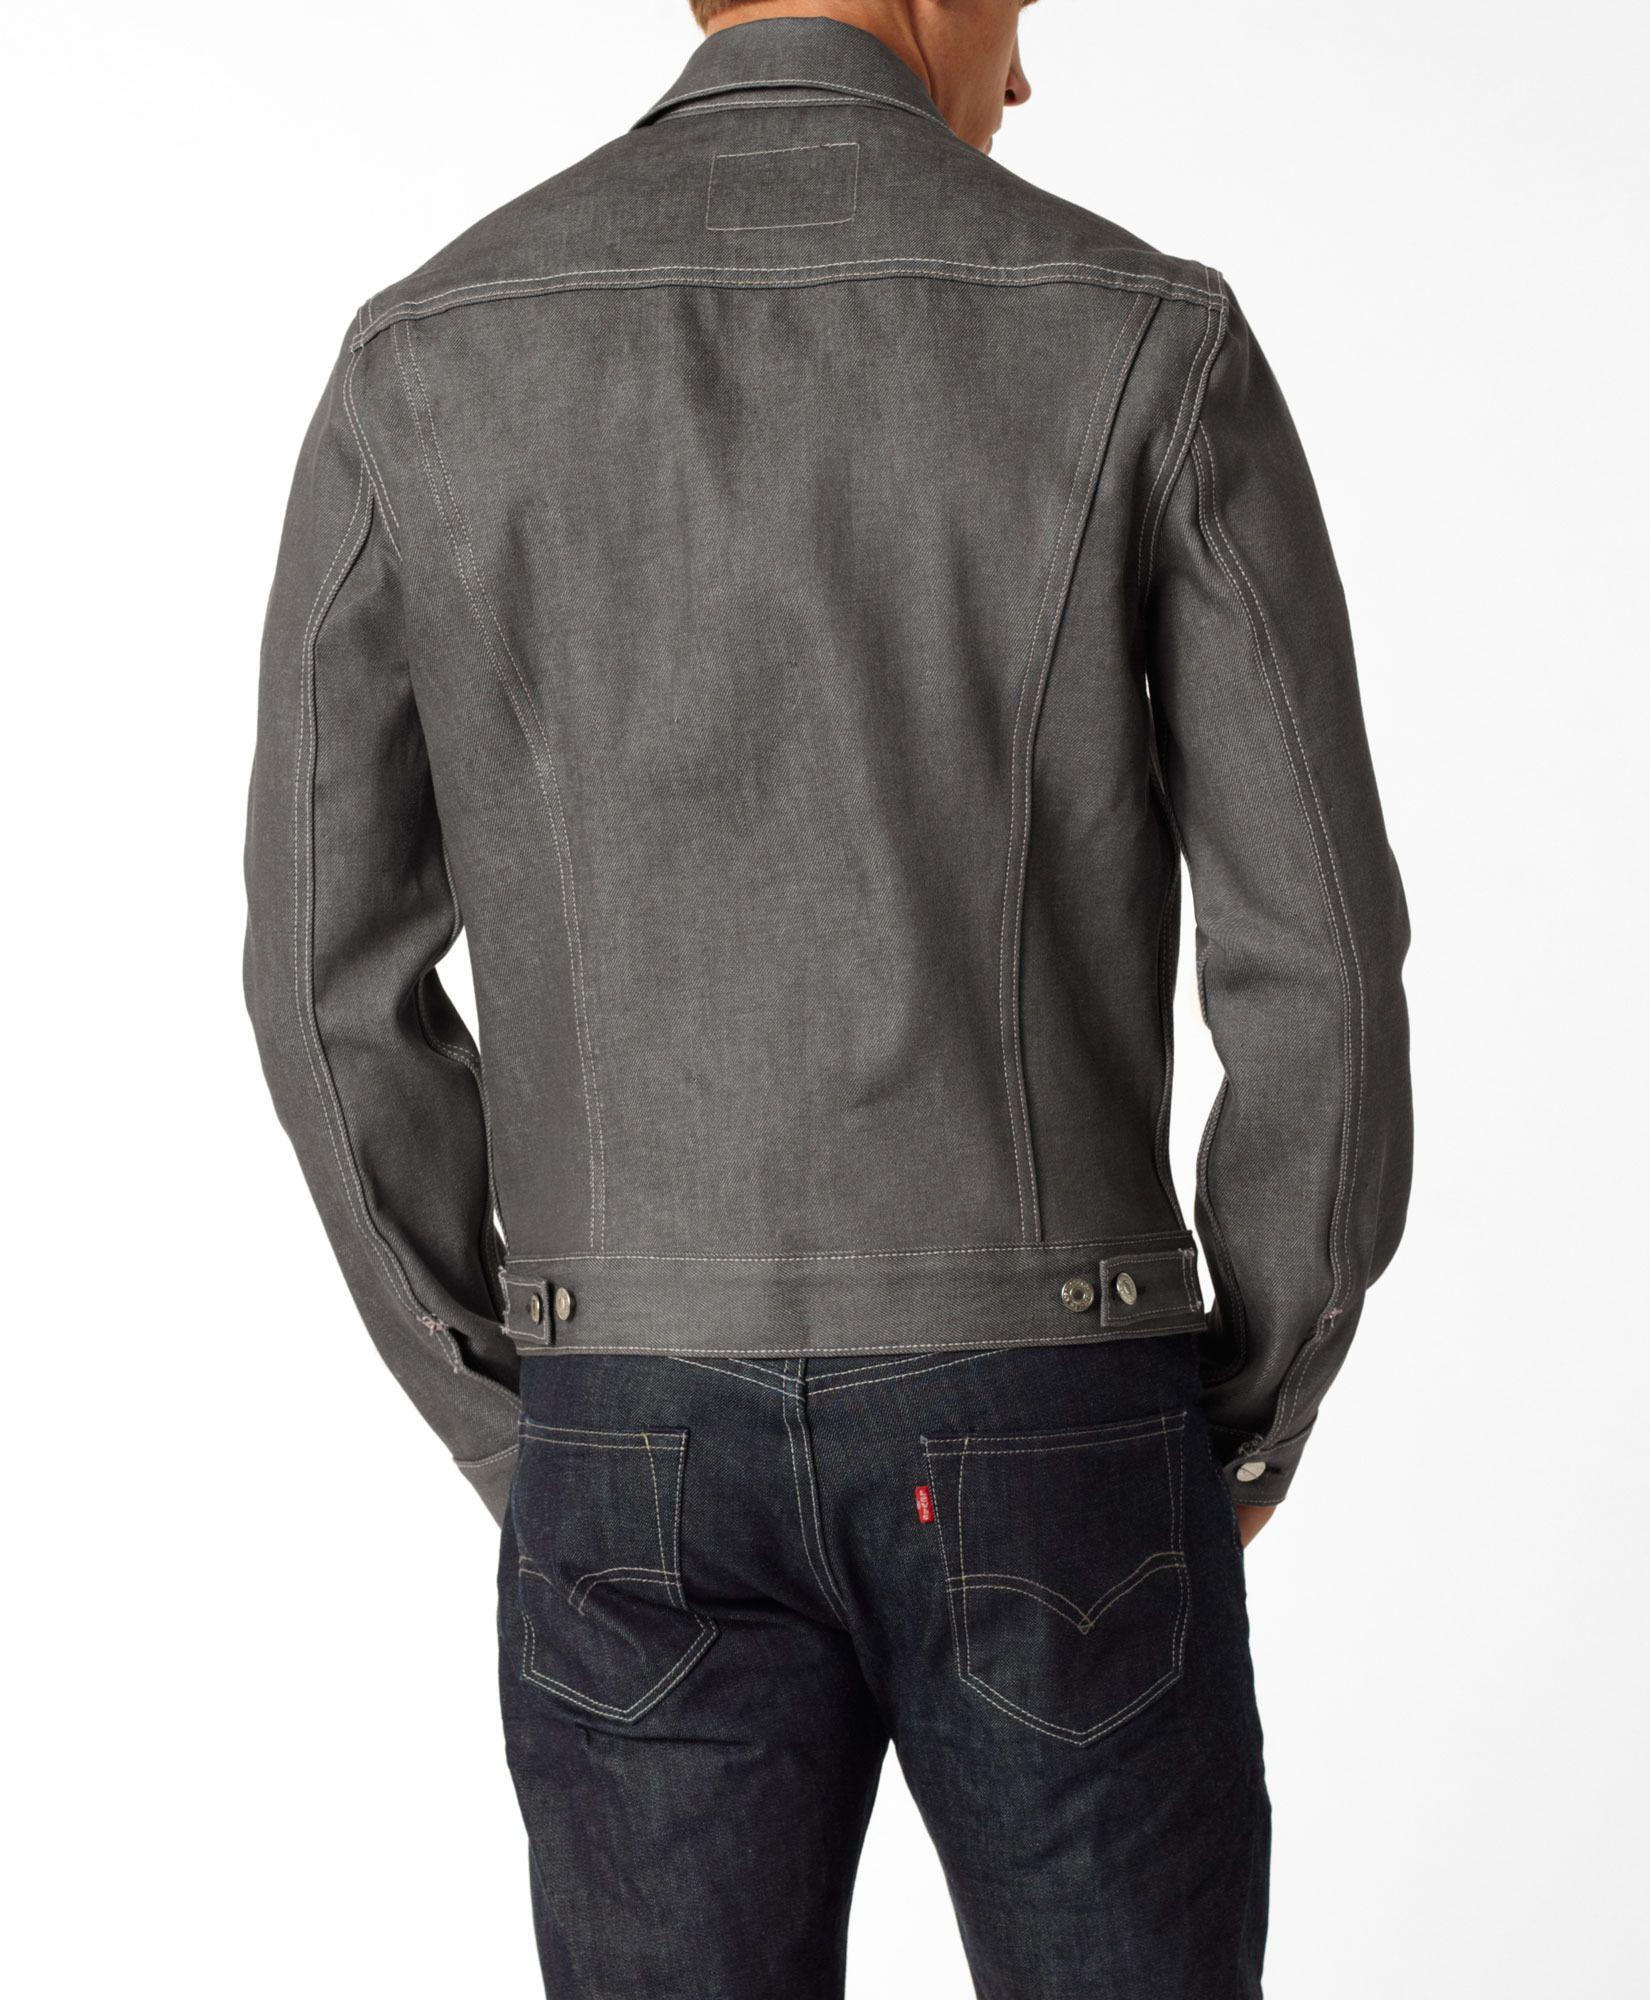 Levi's Standard Trucker Jacket Light Grey Standard Fit